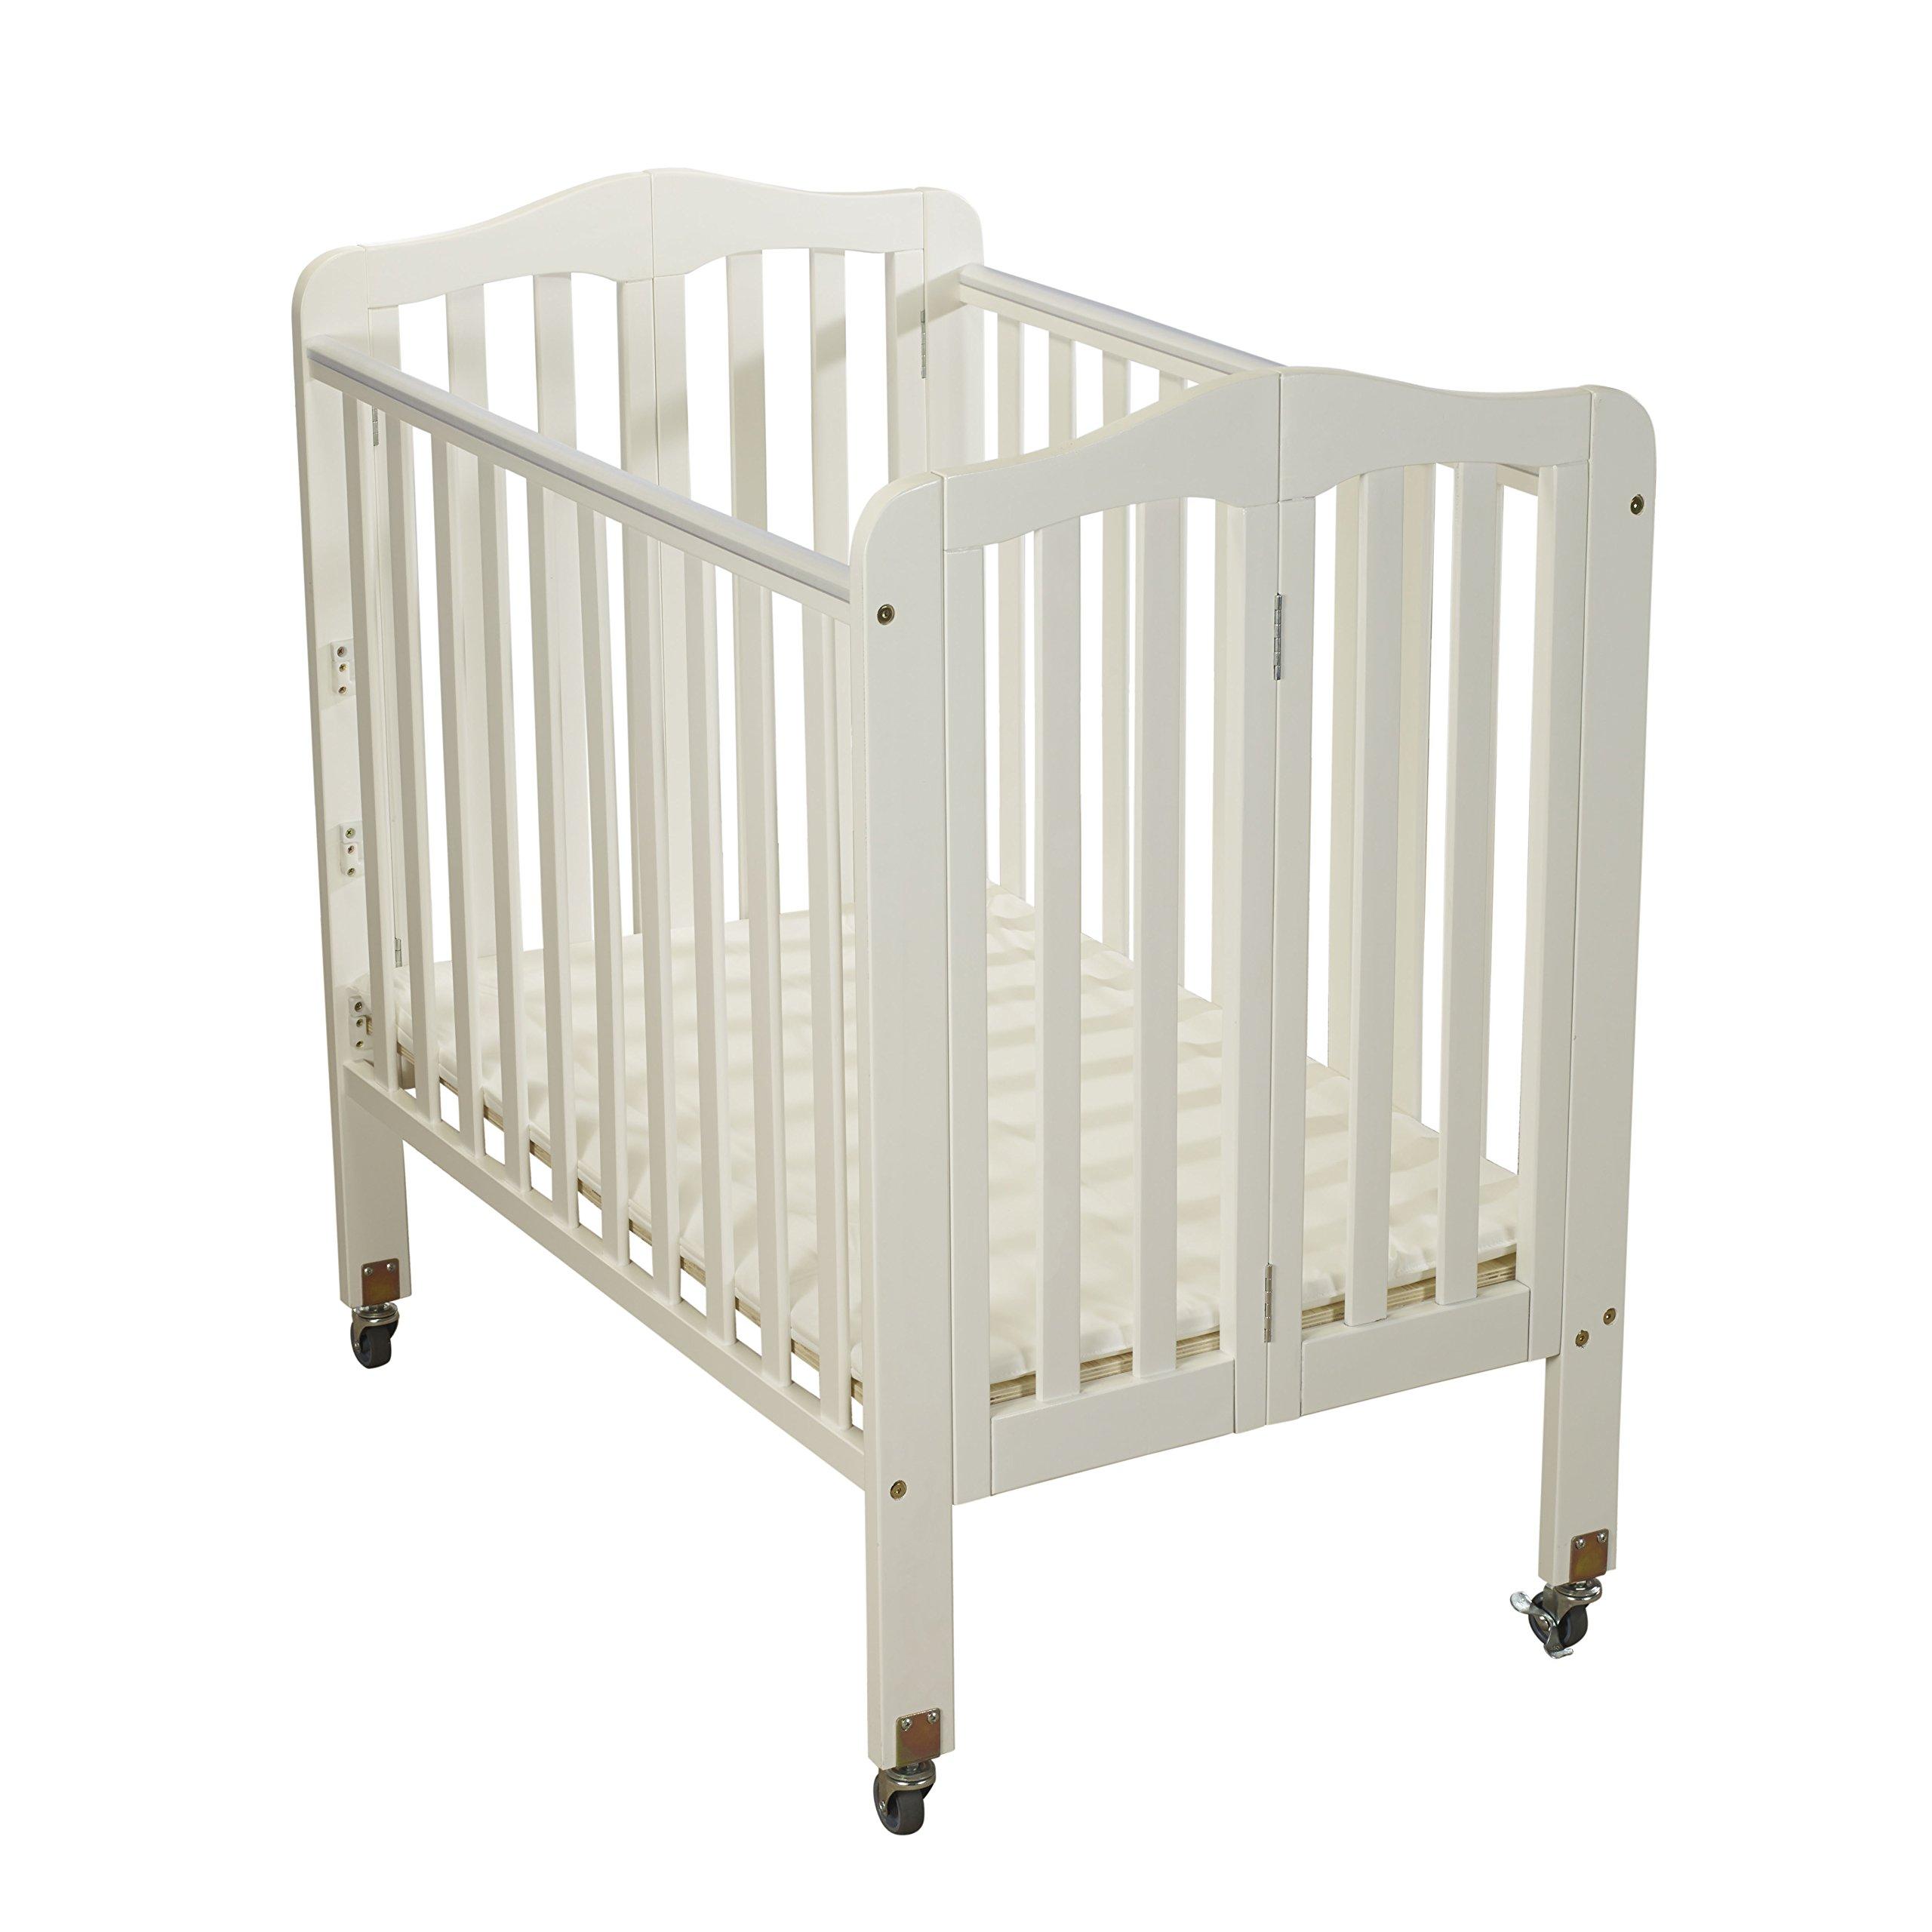 Big Oshi Angela Portable, Folding Baby Crib Frame on Wheels - Adjustable Mattress Height, Low to High - Modern, Unisex Wood Design for Boys or Girls - Sturdy, Lightweight, Side Crib, White